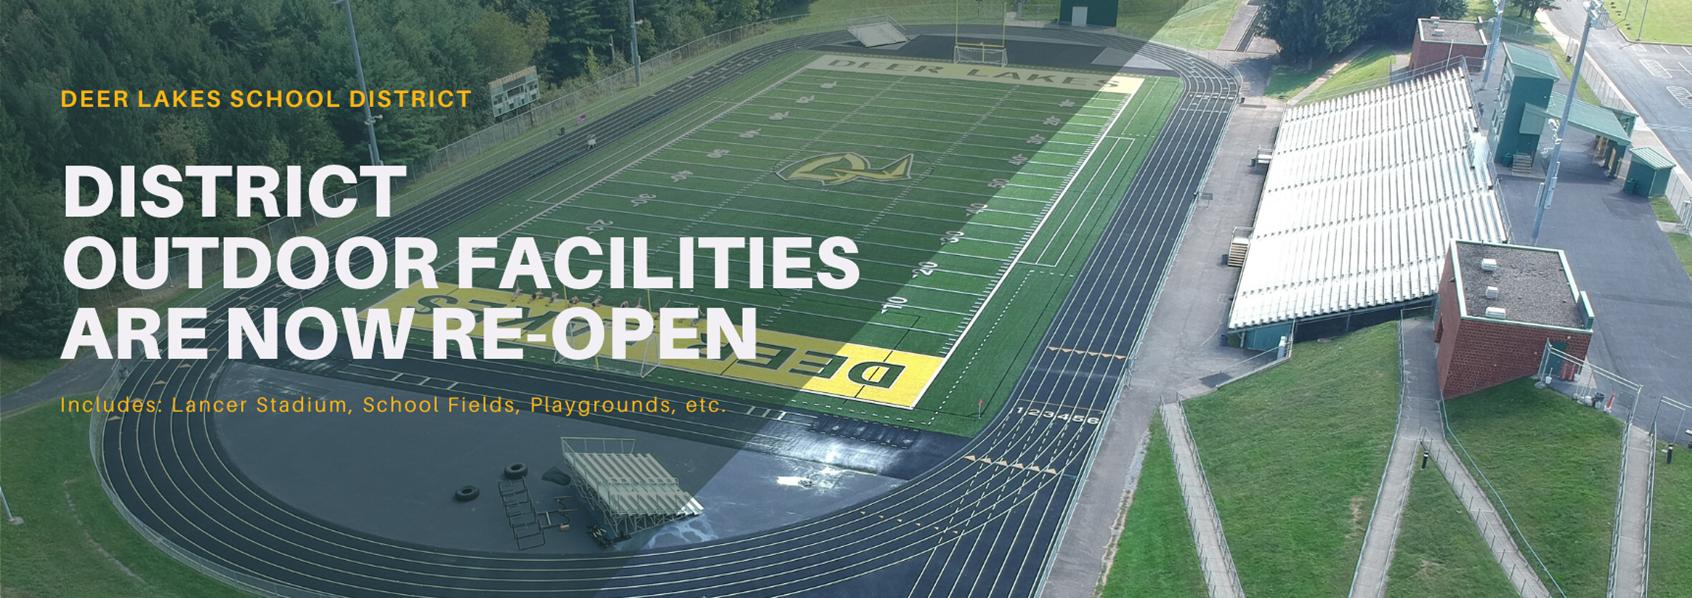 Facilities Re-Open